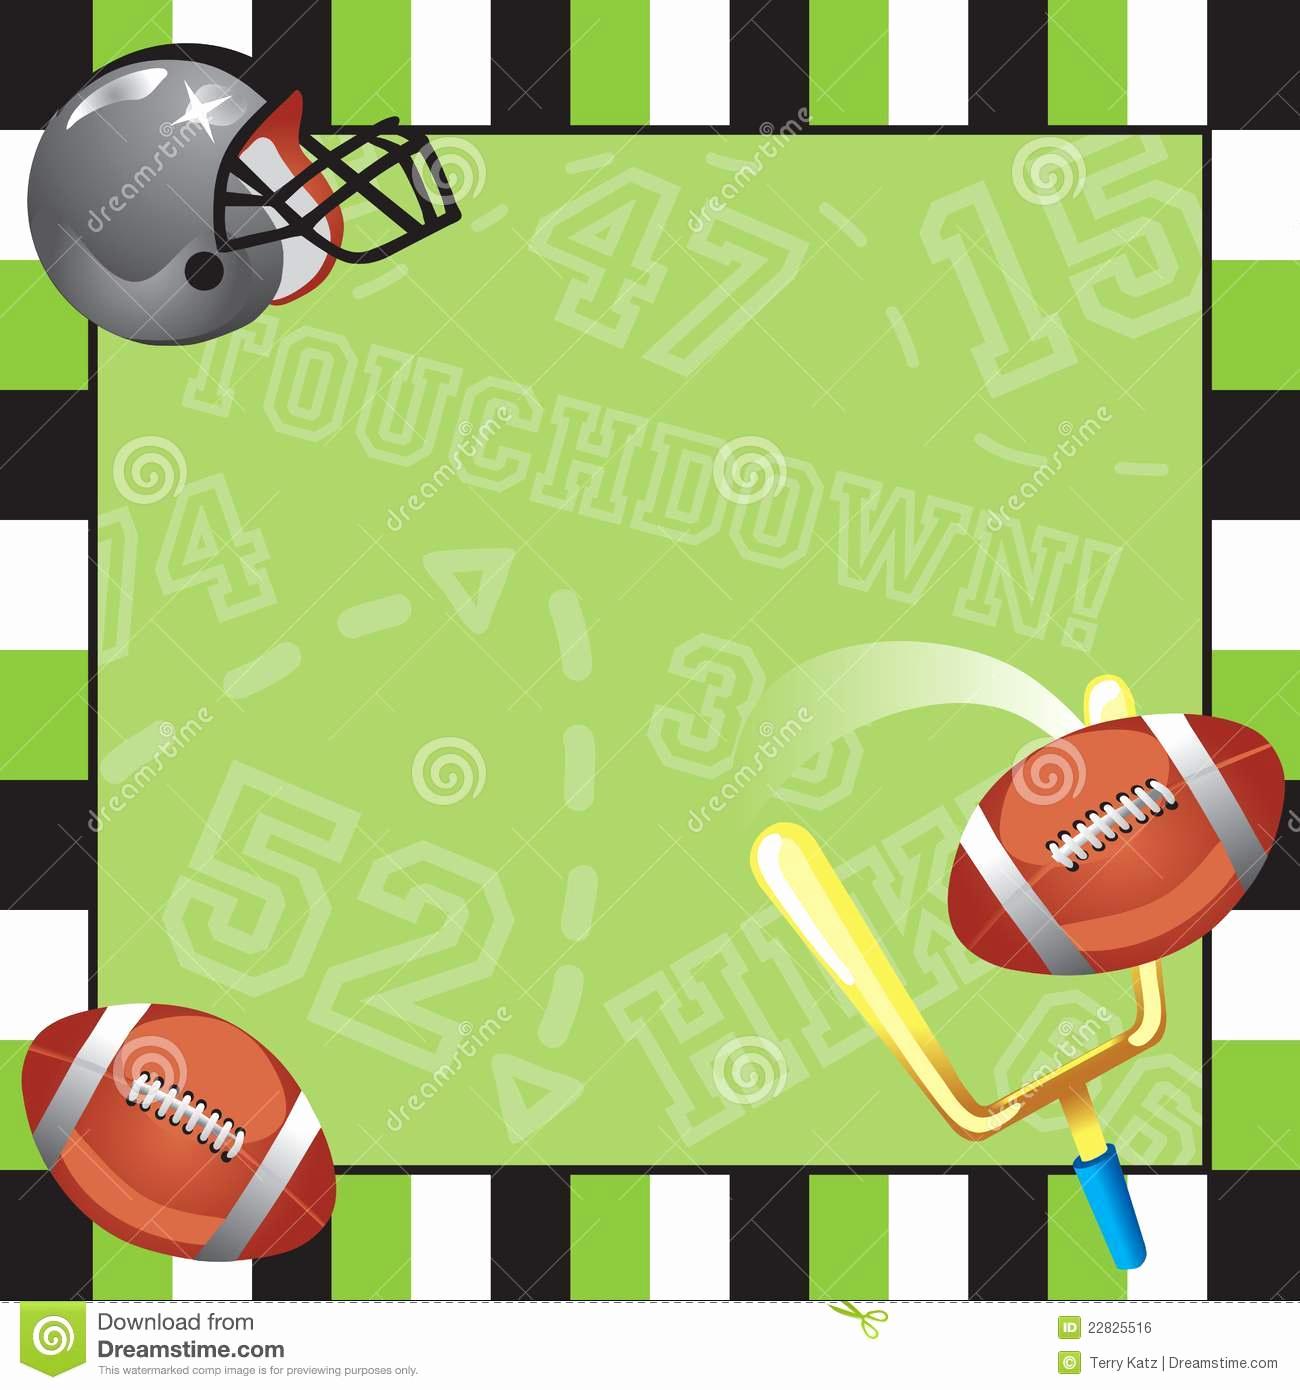 Football Invitation Template Free Beautiful Football Party Invitation Card Royalty Free Stock Image